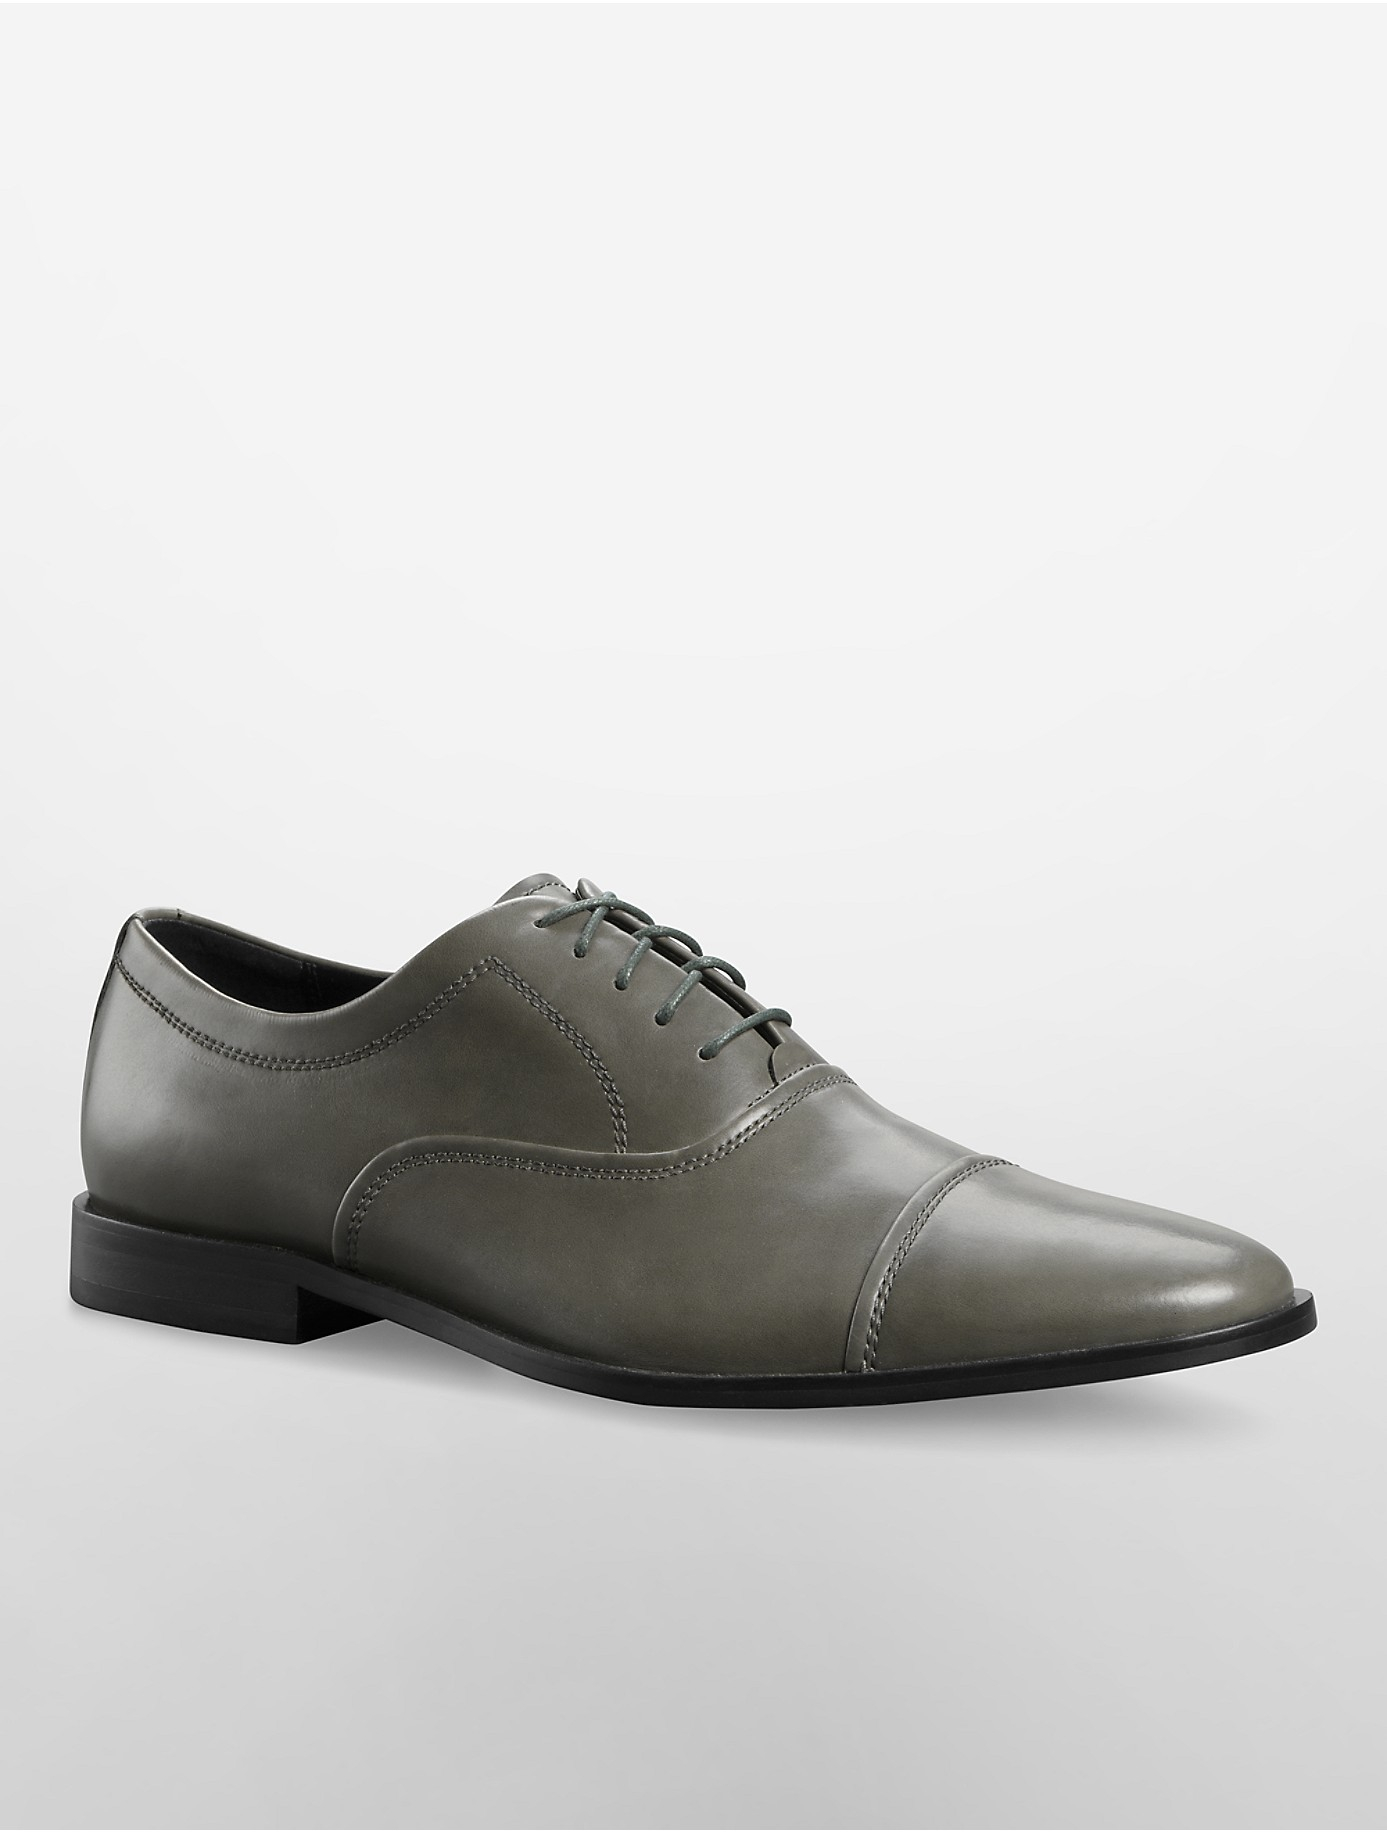 calvin klein nino cap toe oxford in gray grey lyst. Black Bedroom Furniture Sets. Home Design Ideas